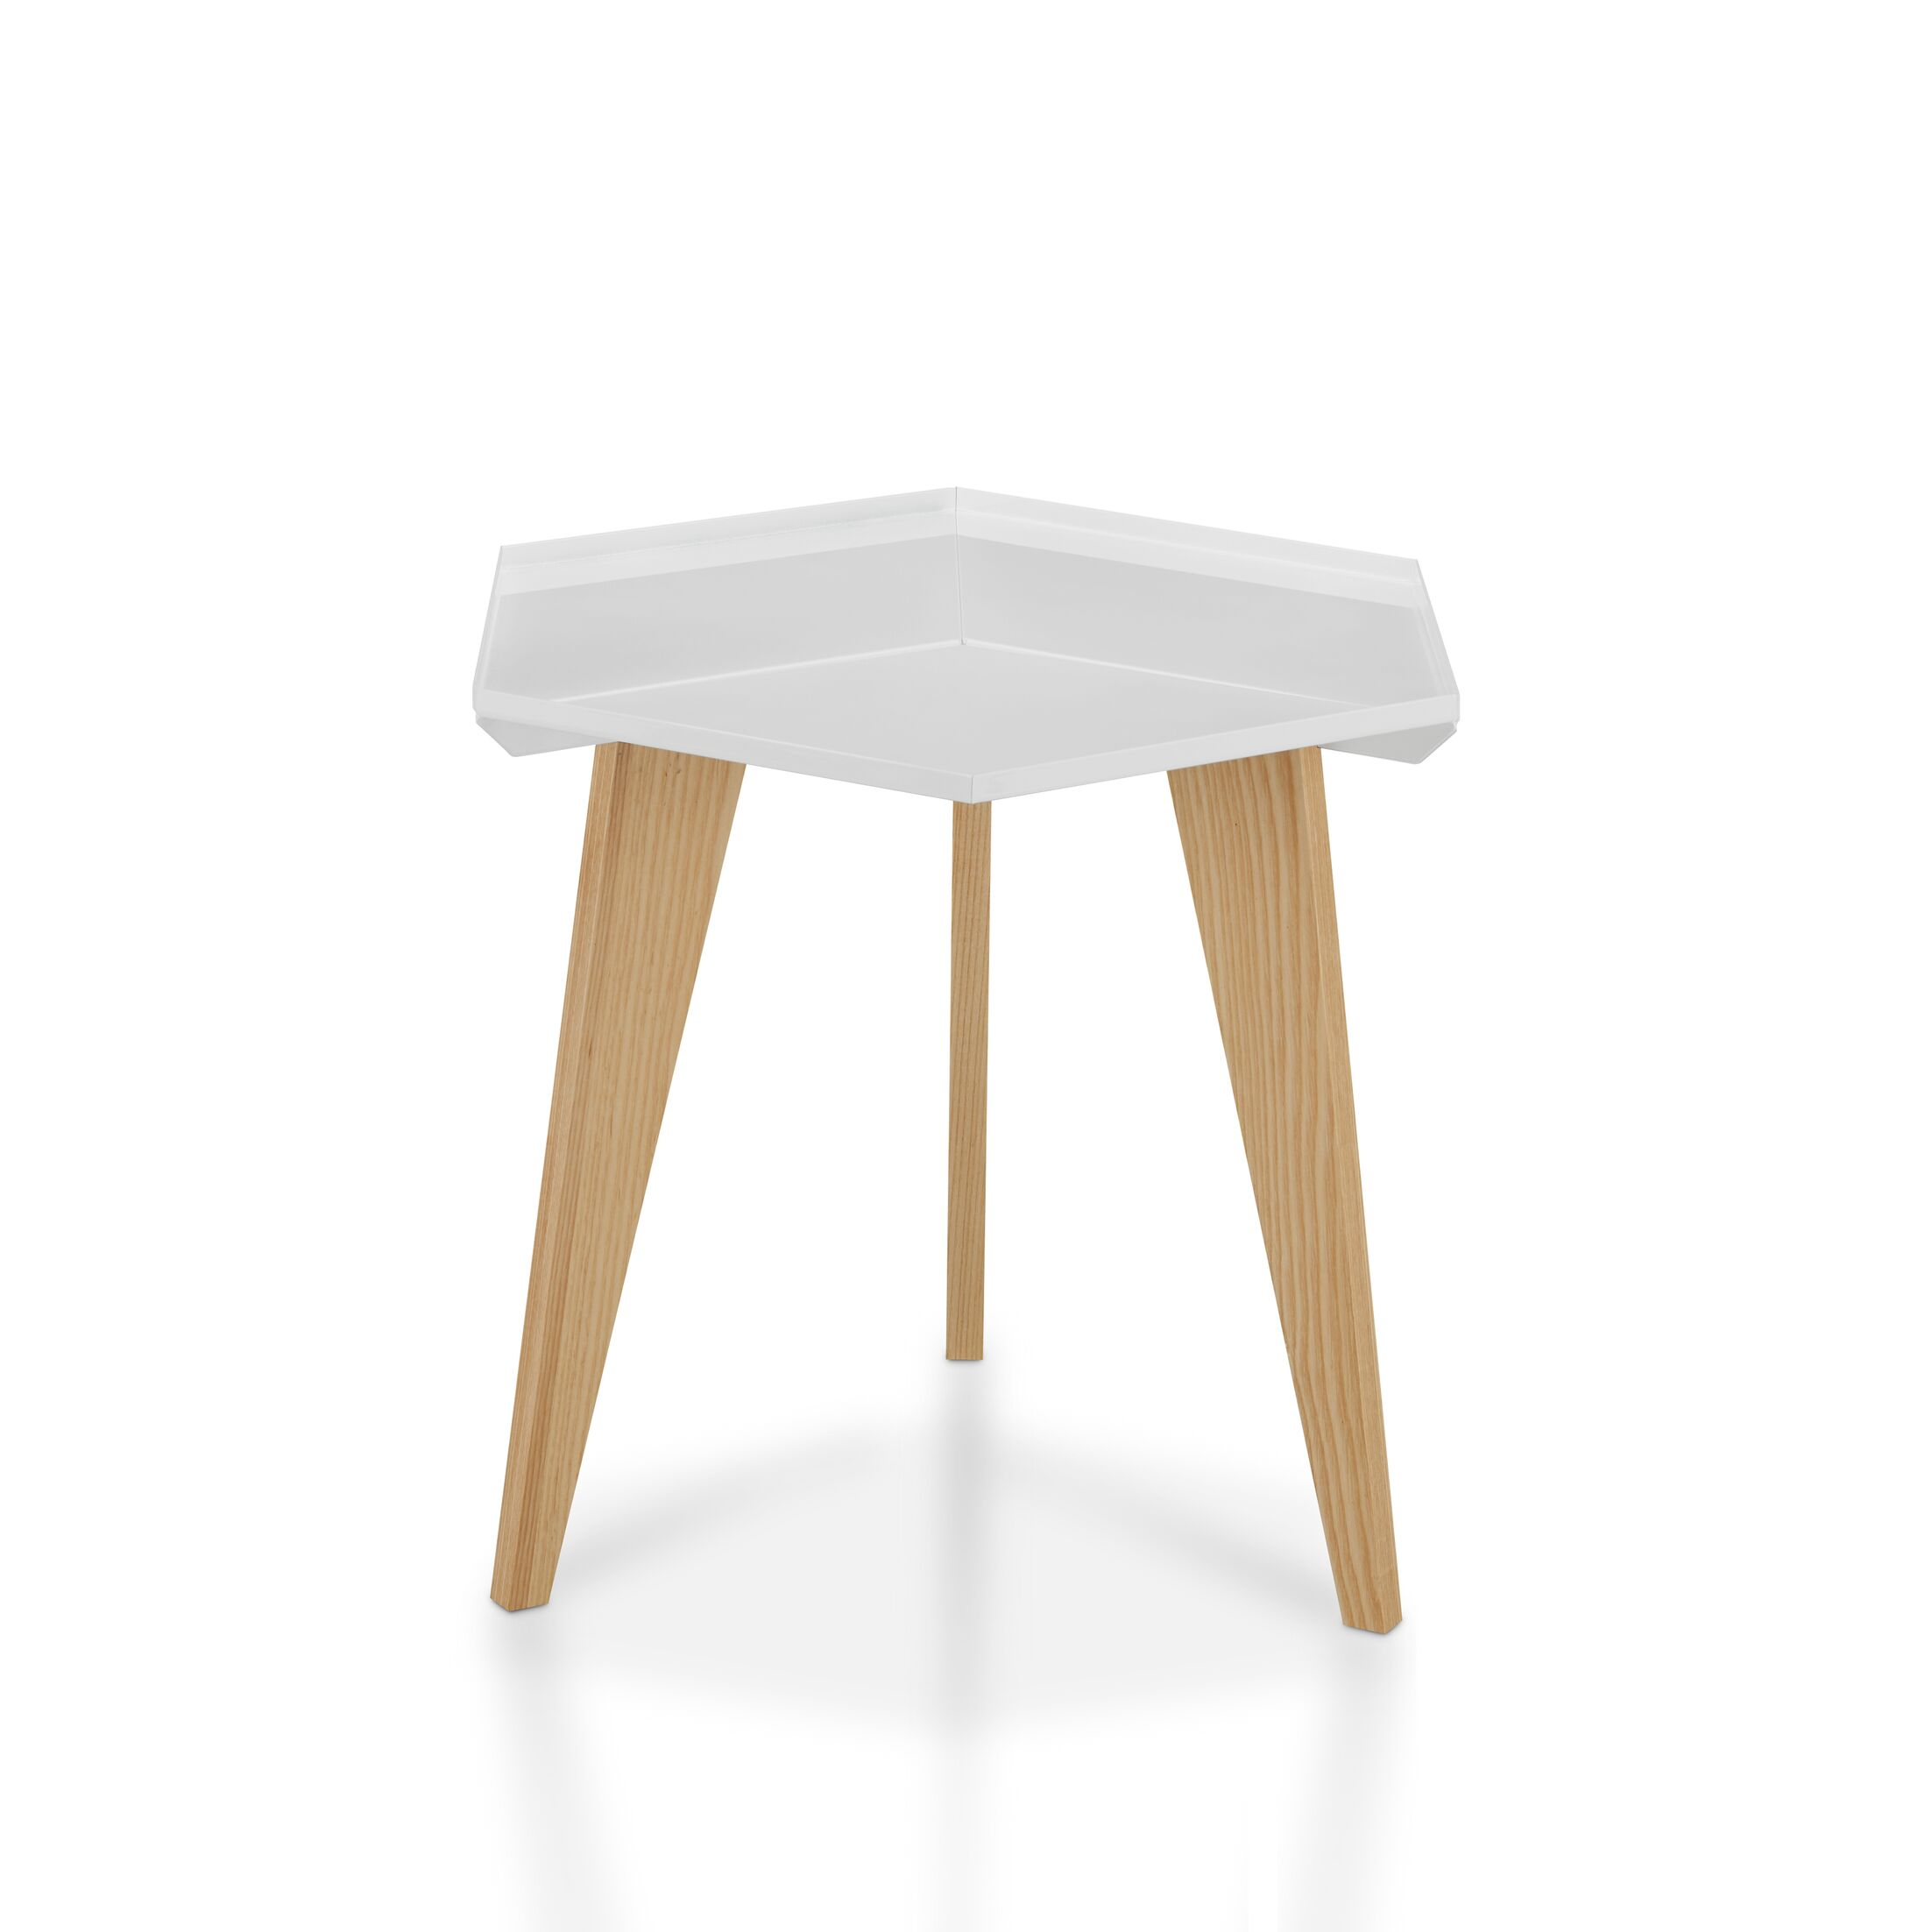 Eteuati End Table Color: White